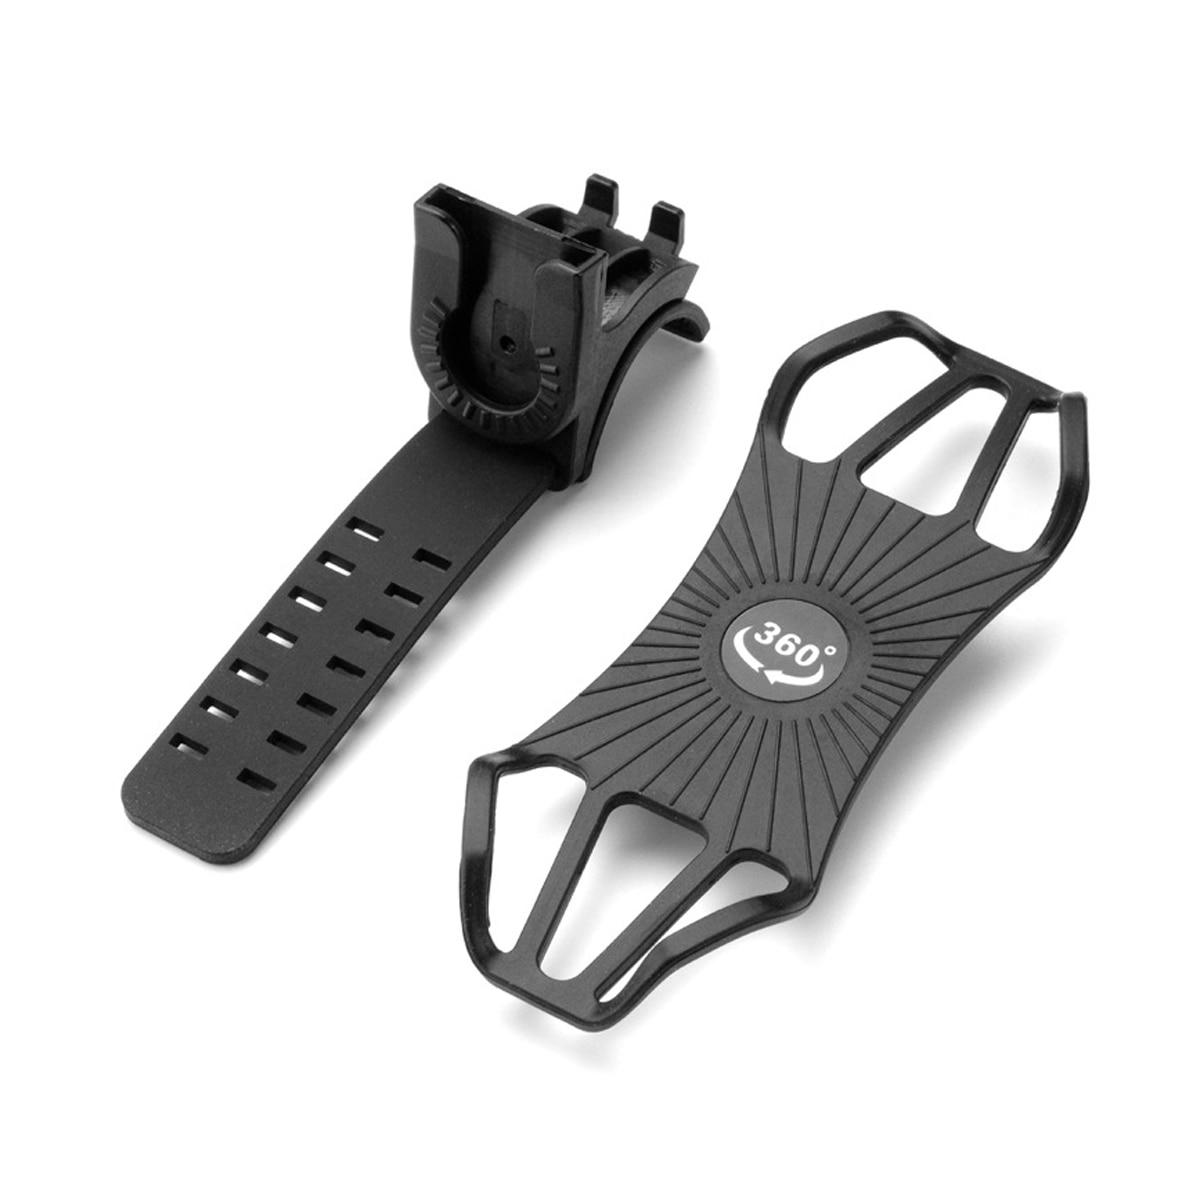 Soporte de pared para bicicleta, soporte de muestra para bicicleta, negro, rotación de 360 °, diseño desmontable, gancho para colgar bicicletas, accesorios de montaña